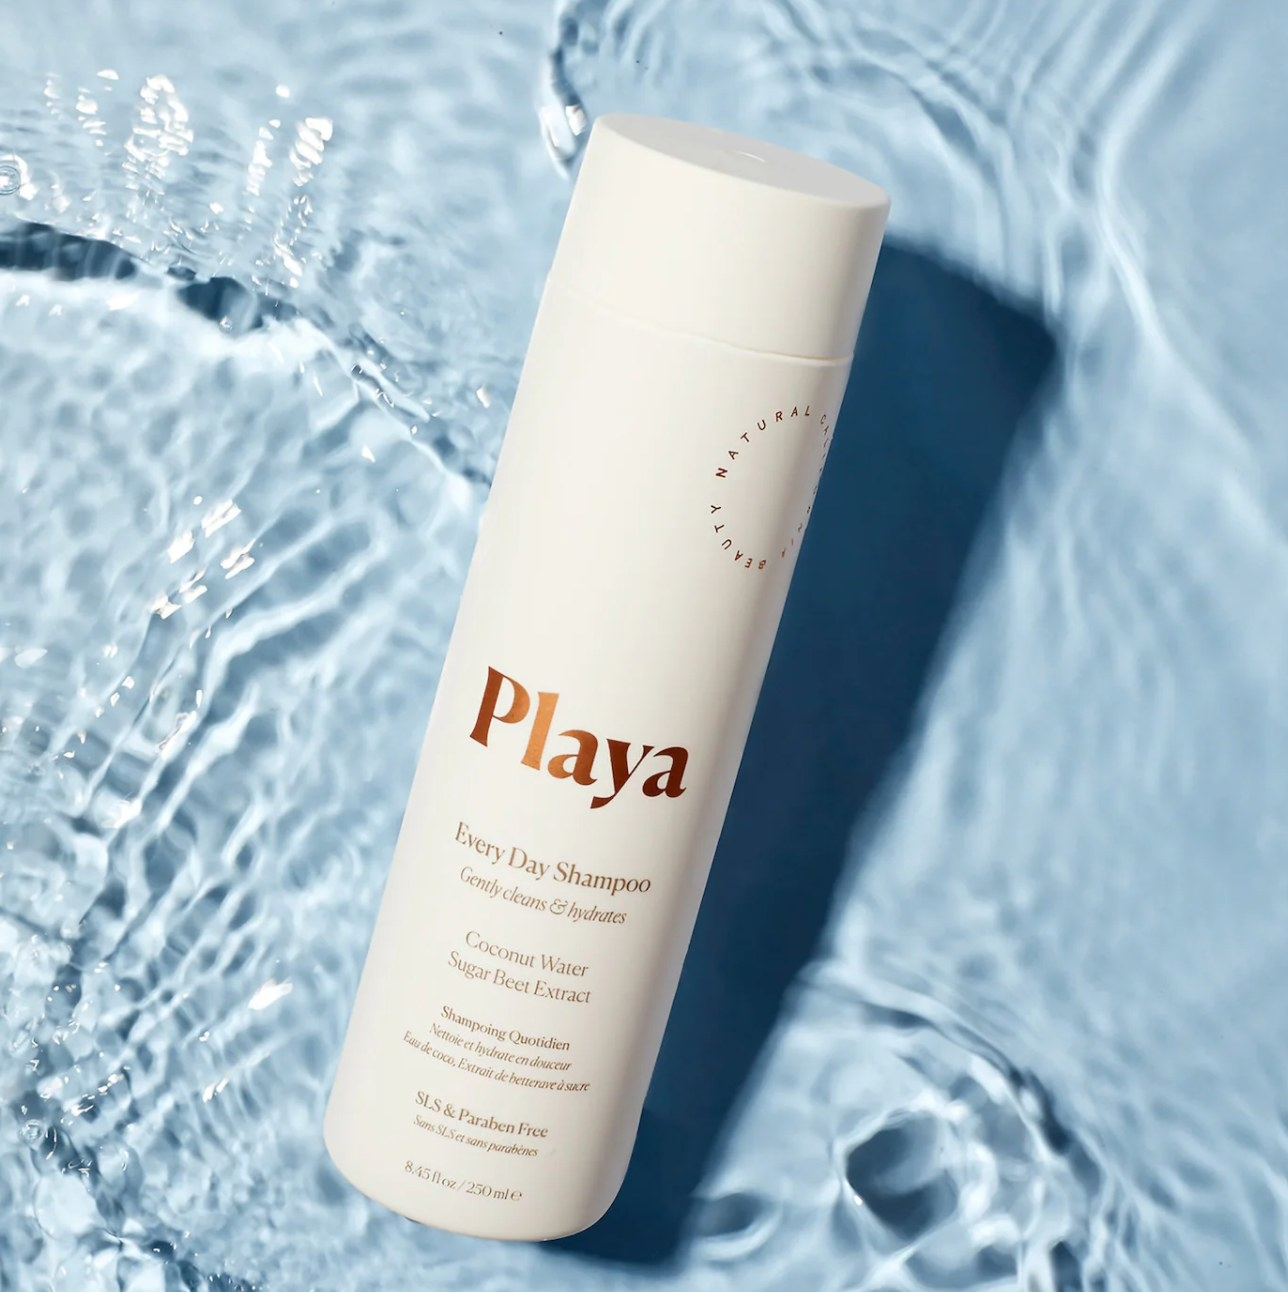 Playa everyday shampoo bottle against water